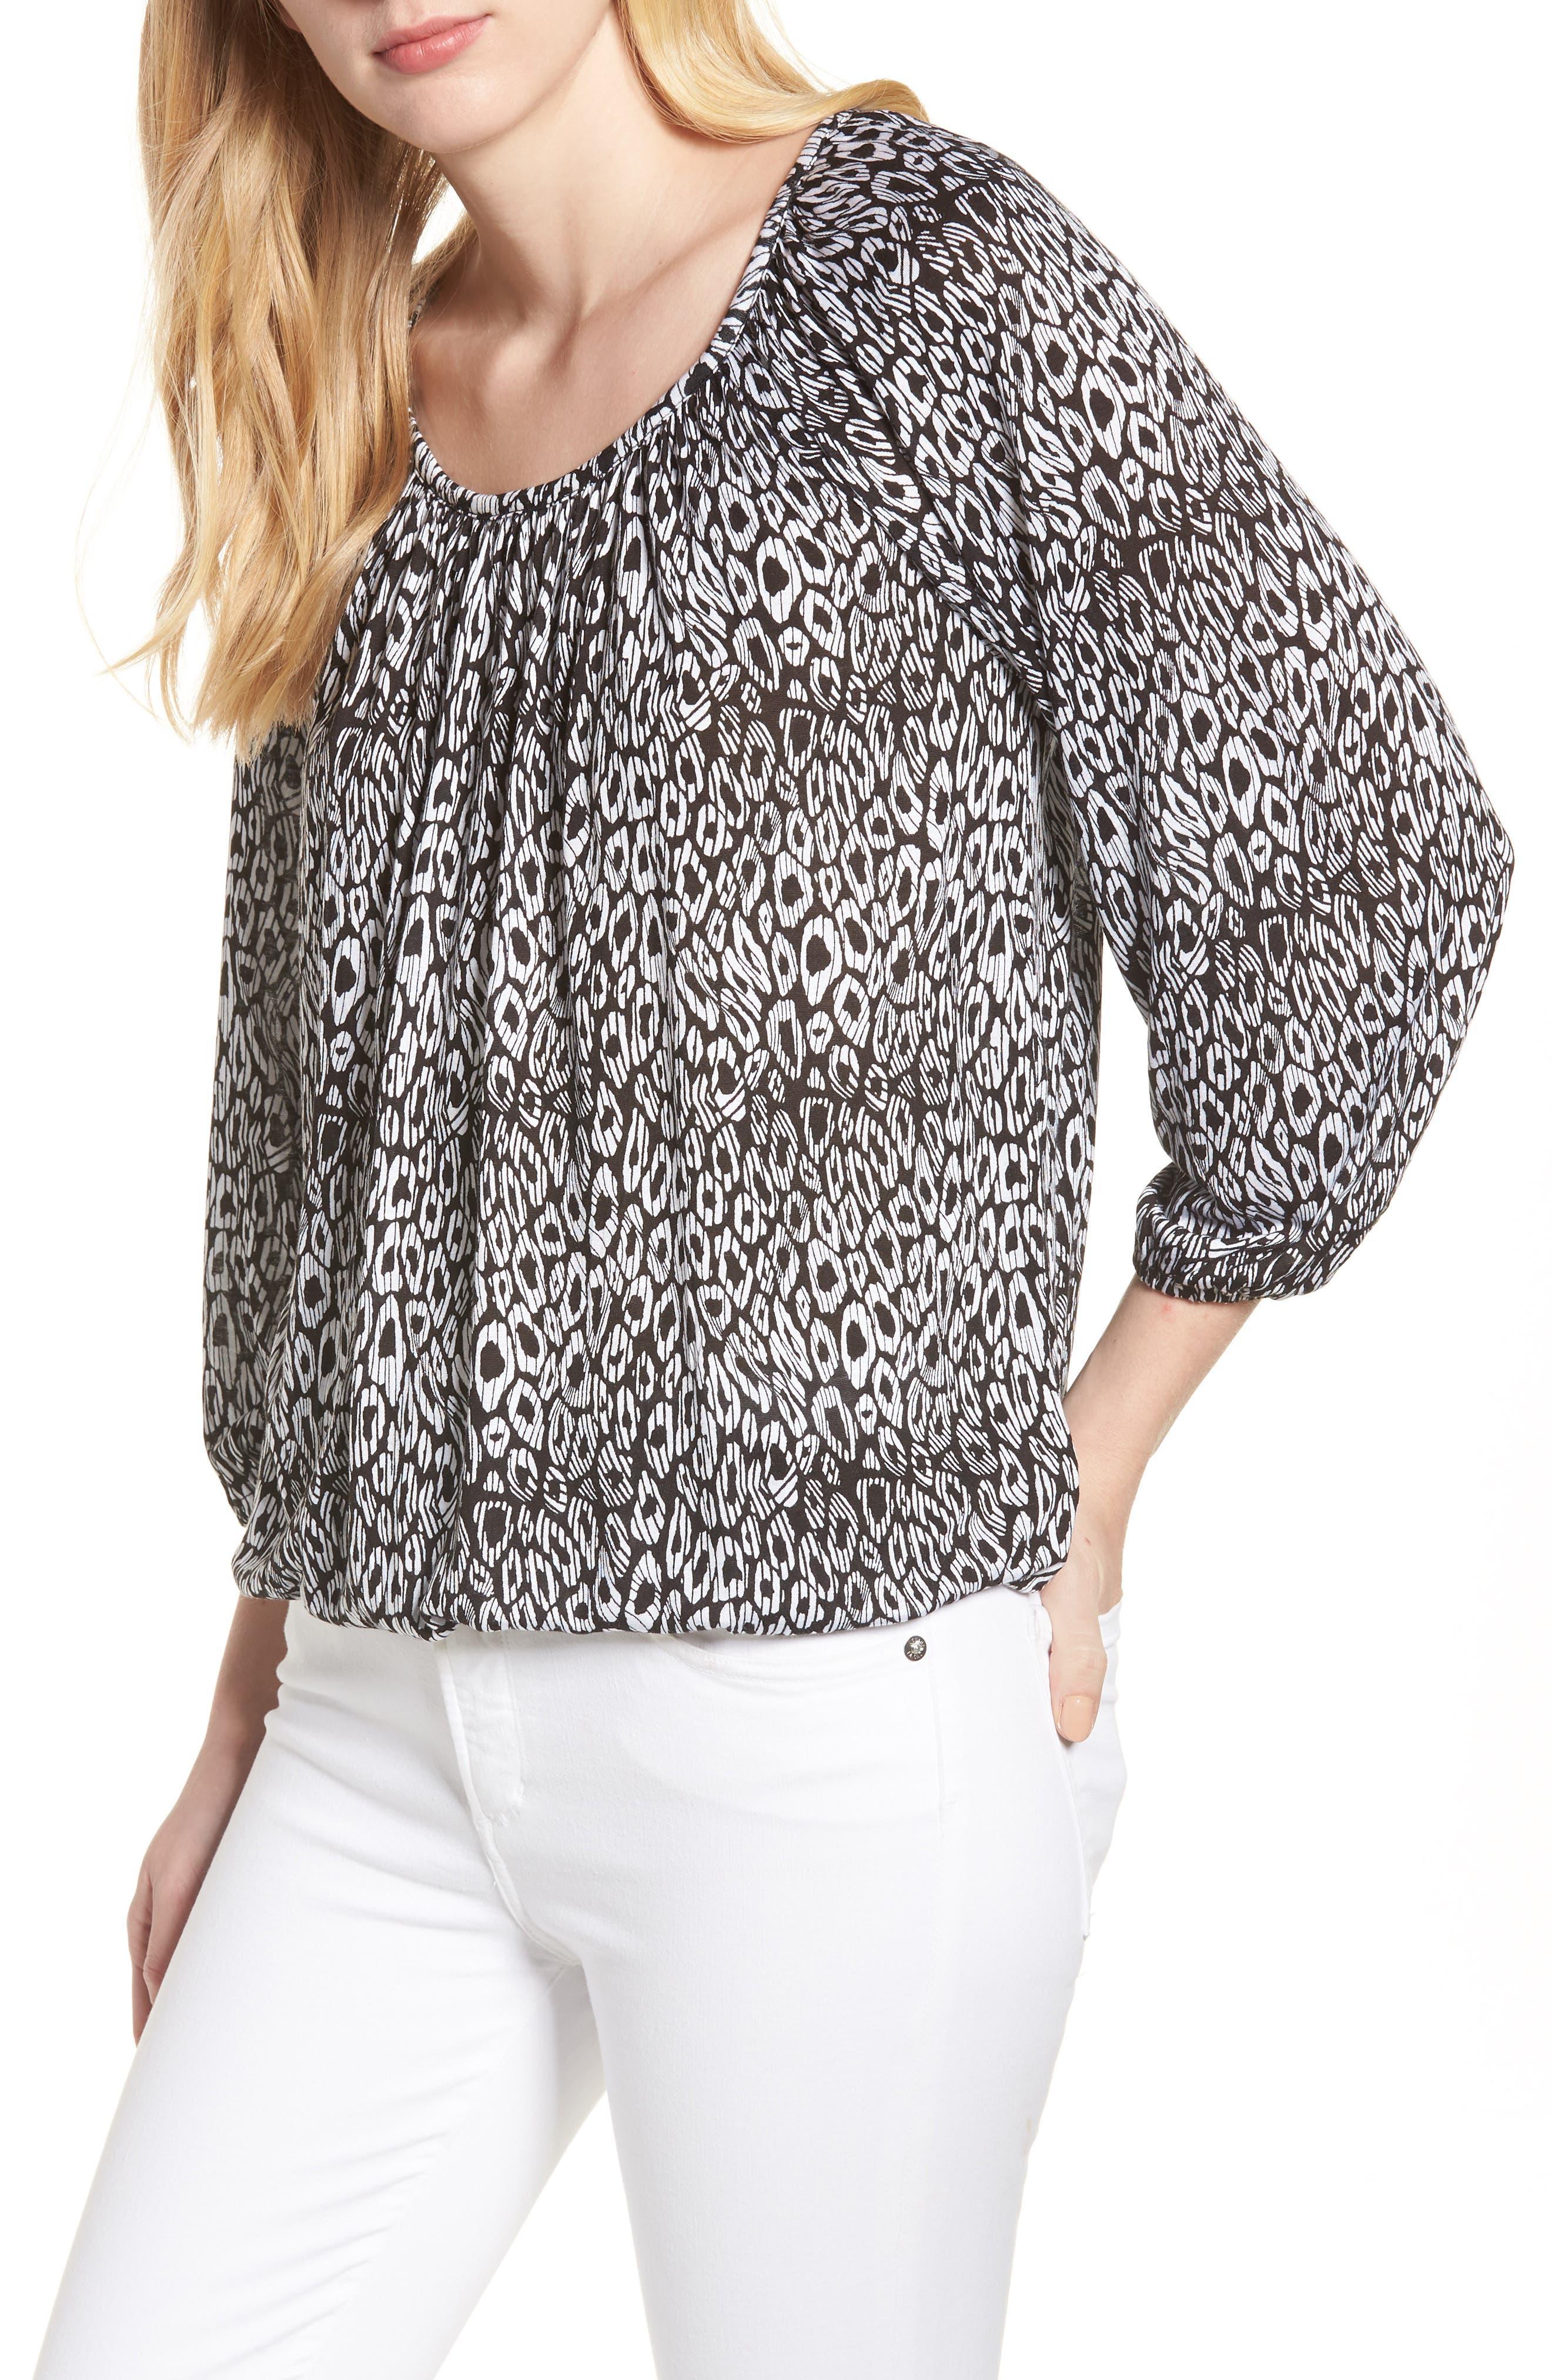 Wavy Leopard Stripe Peasant Top,                             Main thumbnail 1, color,                             Black/ White